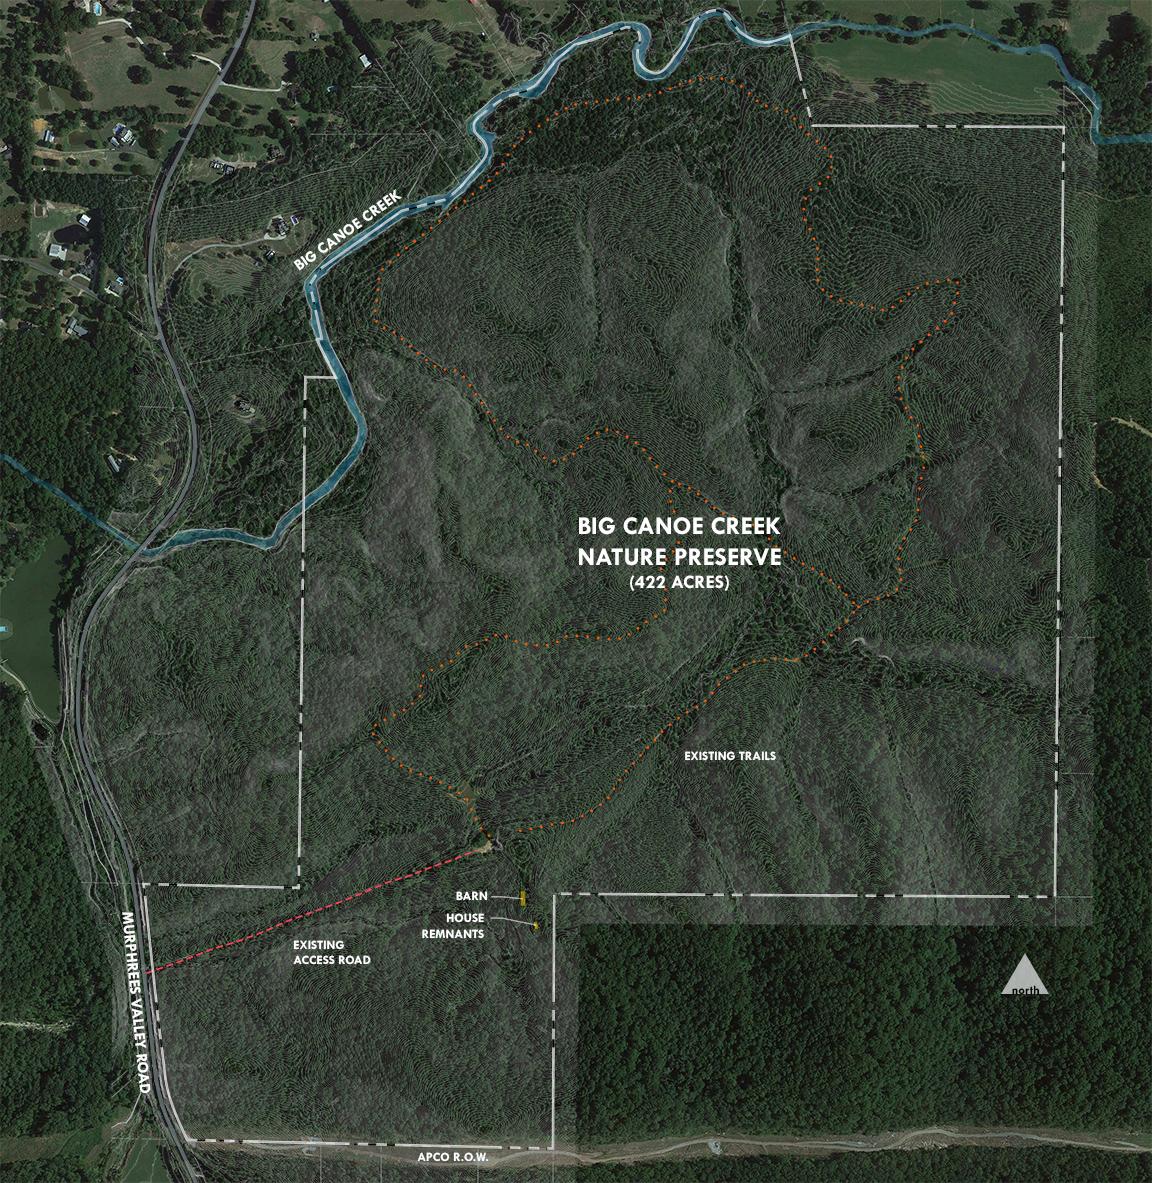 Big Canoe Creek Nature Preserve